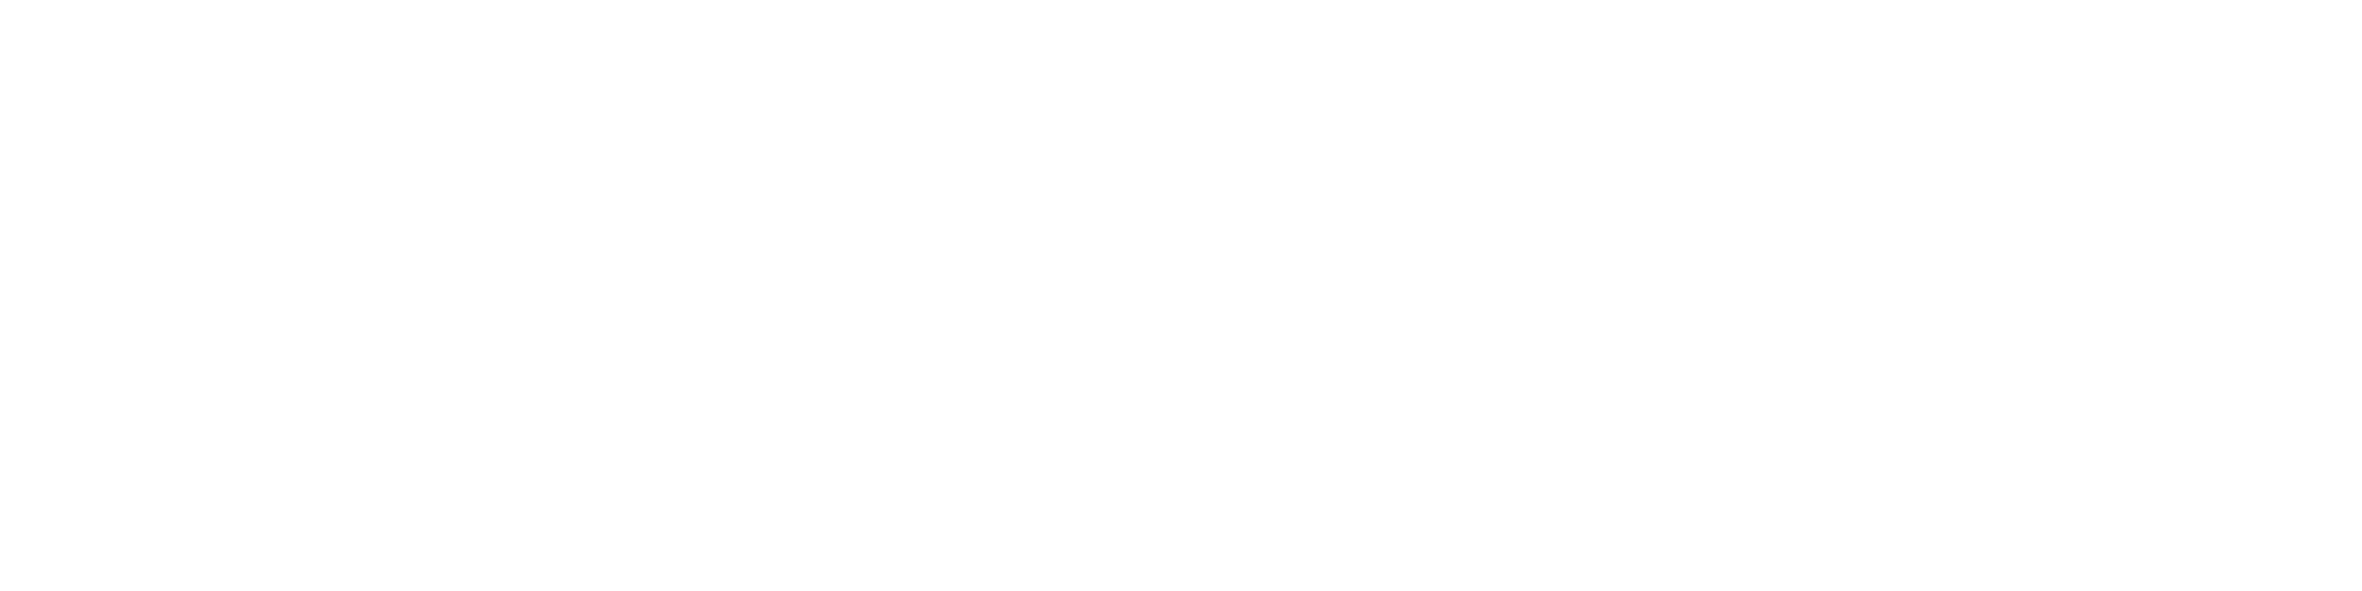 Enstar Capital